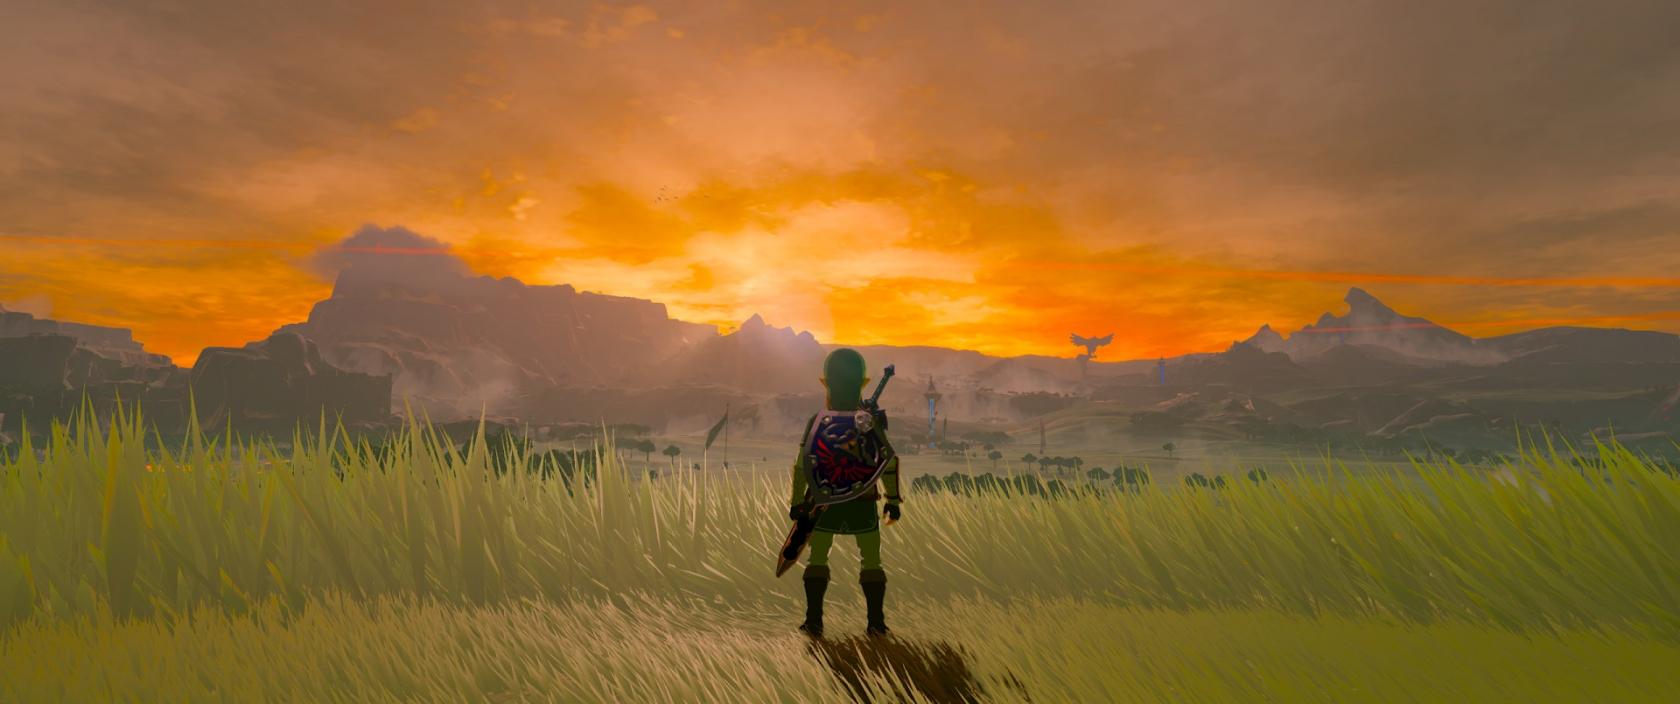 Gfx Pack Boosts Visuals In Zelda Breath Of The Wild S Pc Version